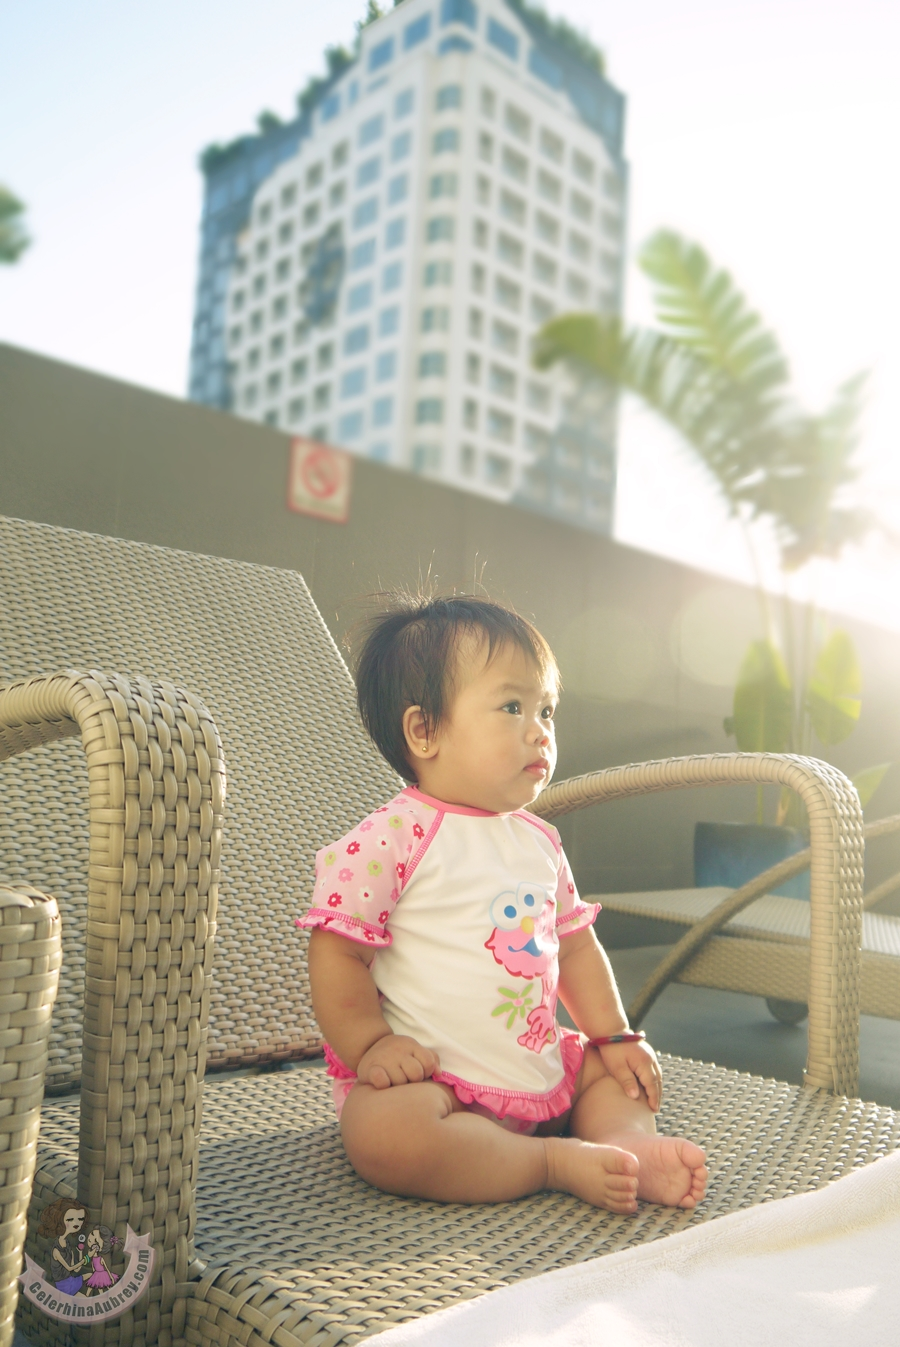 Target-Baby-Swimsuit-Girls (4)